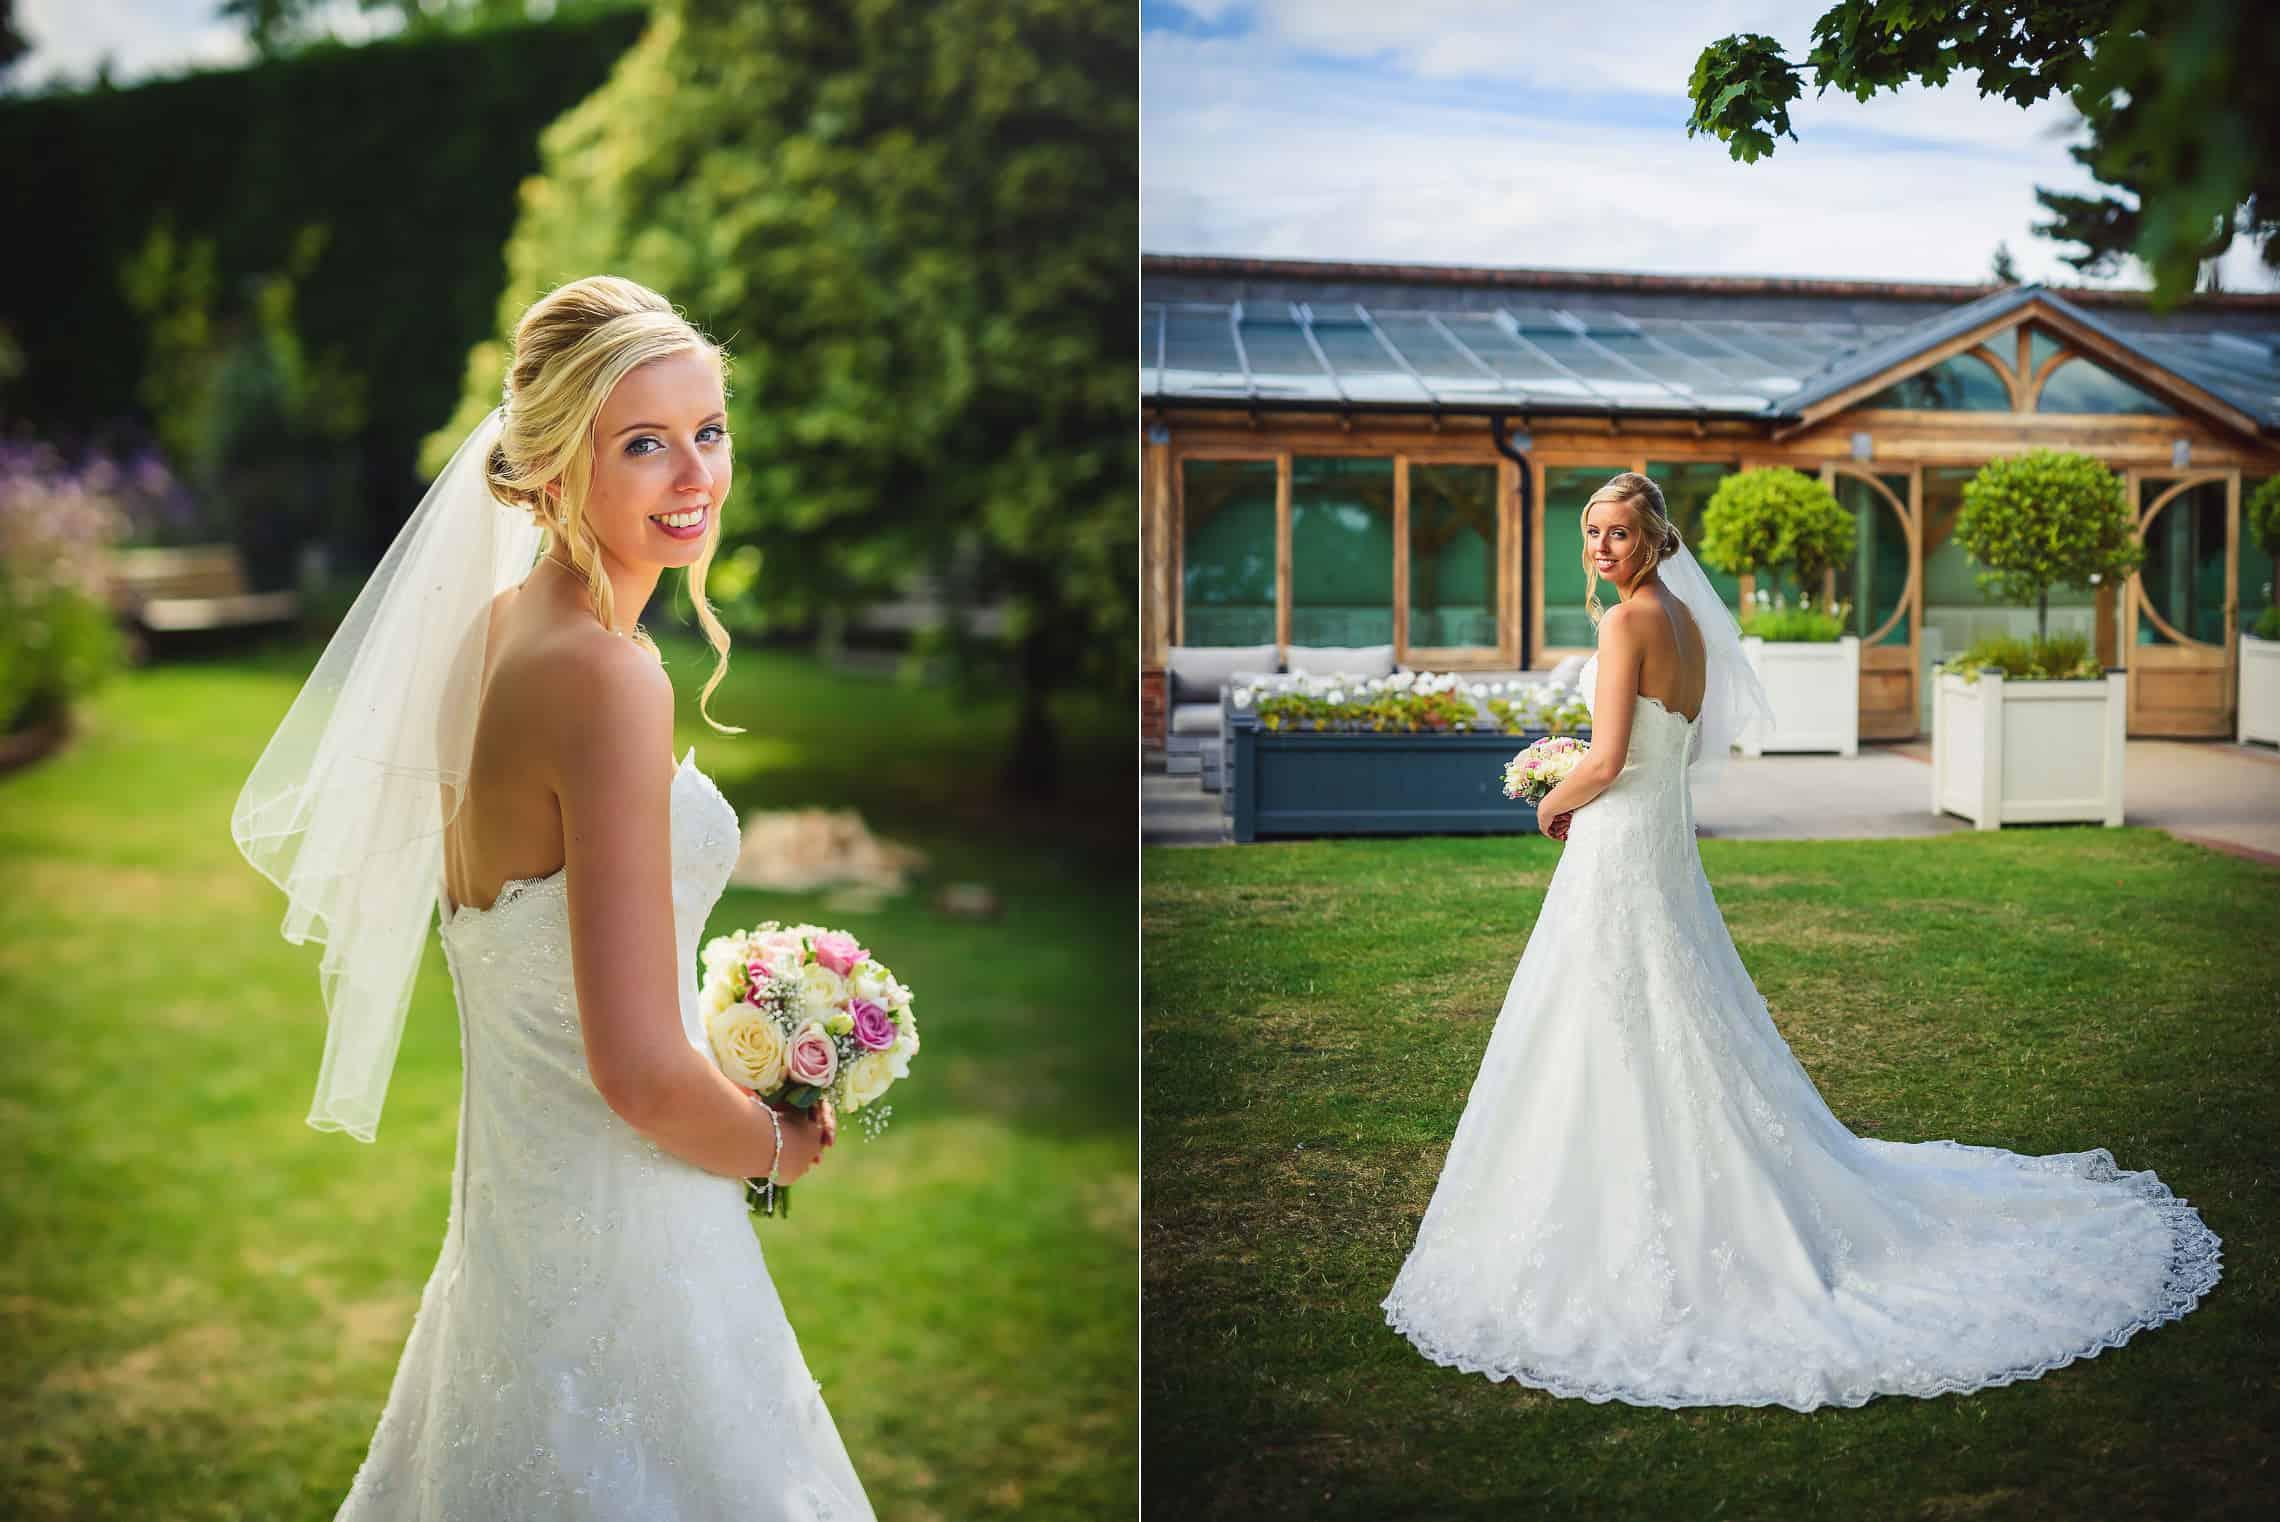 gaynes_park_wedding_lm_justin_bailey_photography_010